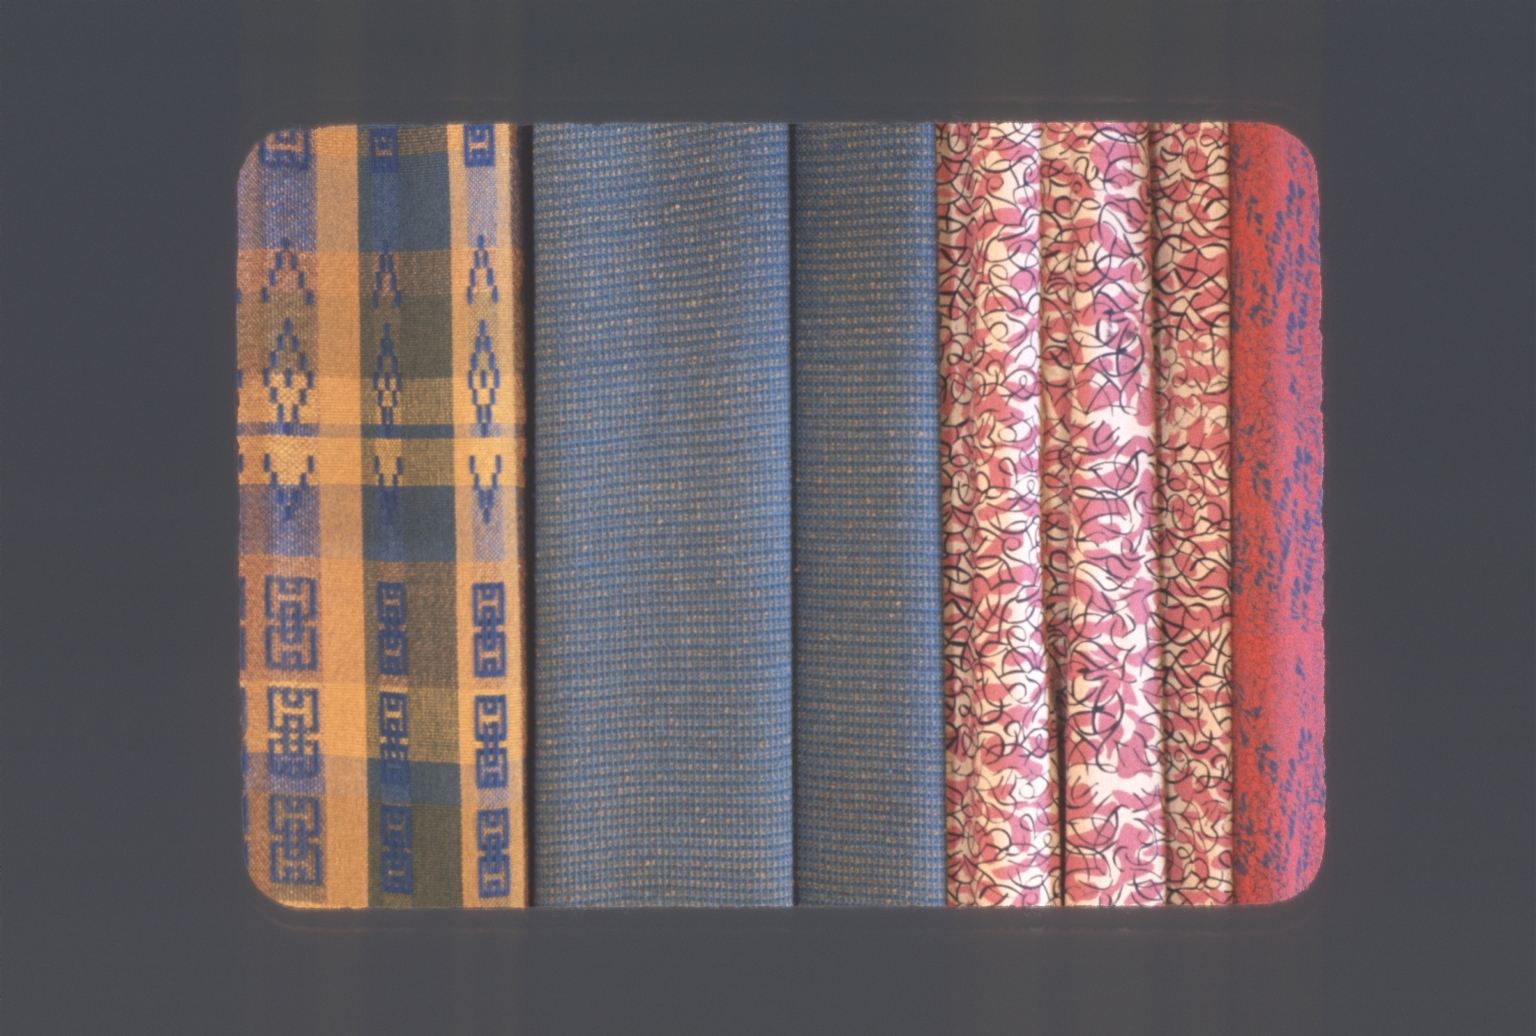 Unidentified Student Textiles